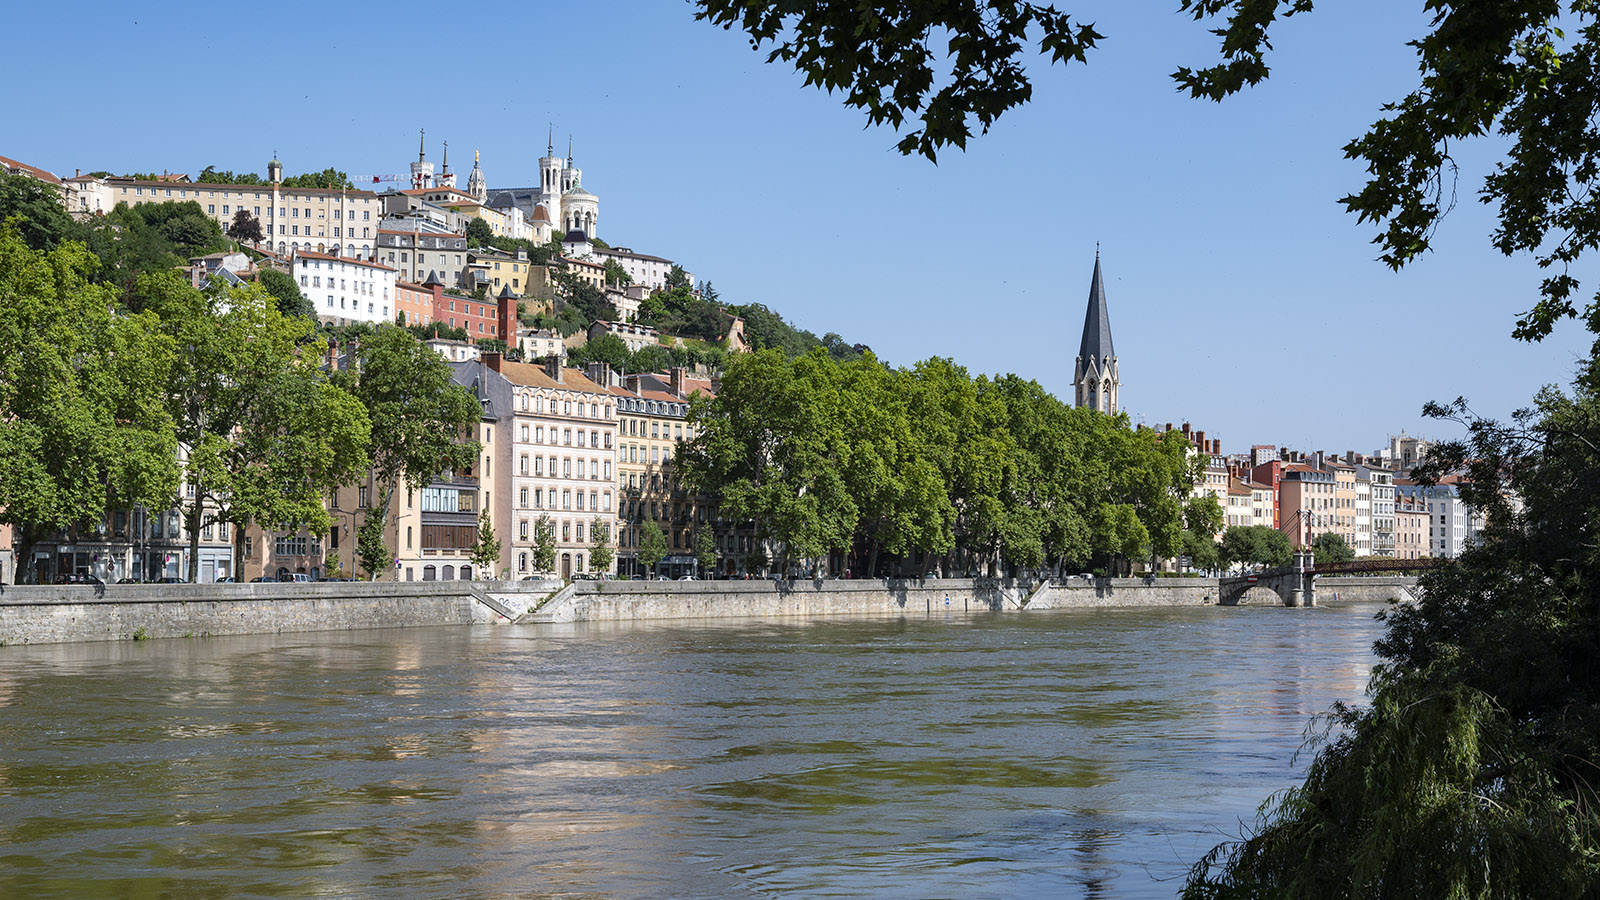 Angekommen am Ziel: die Sâone in Lyon. Foto: Hilke Maunder